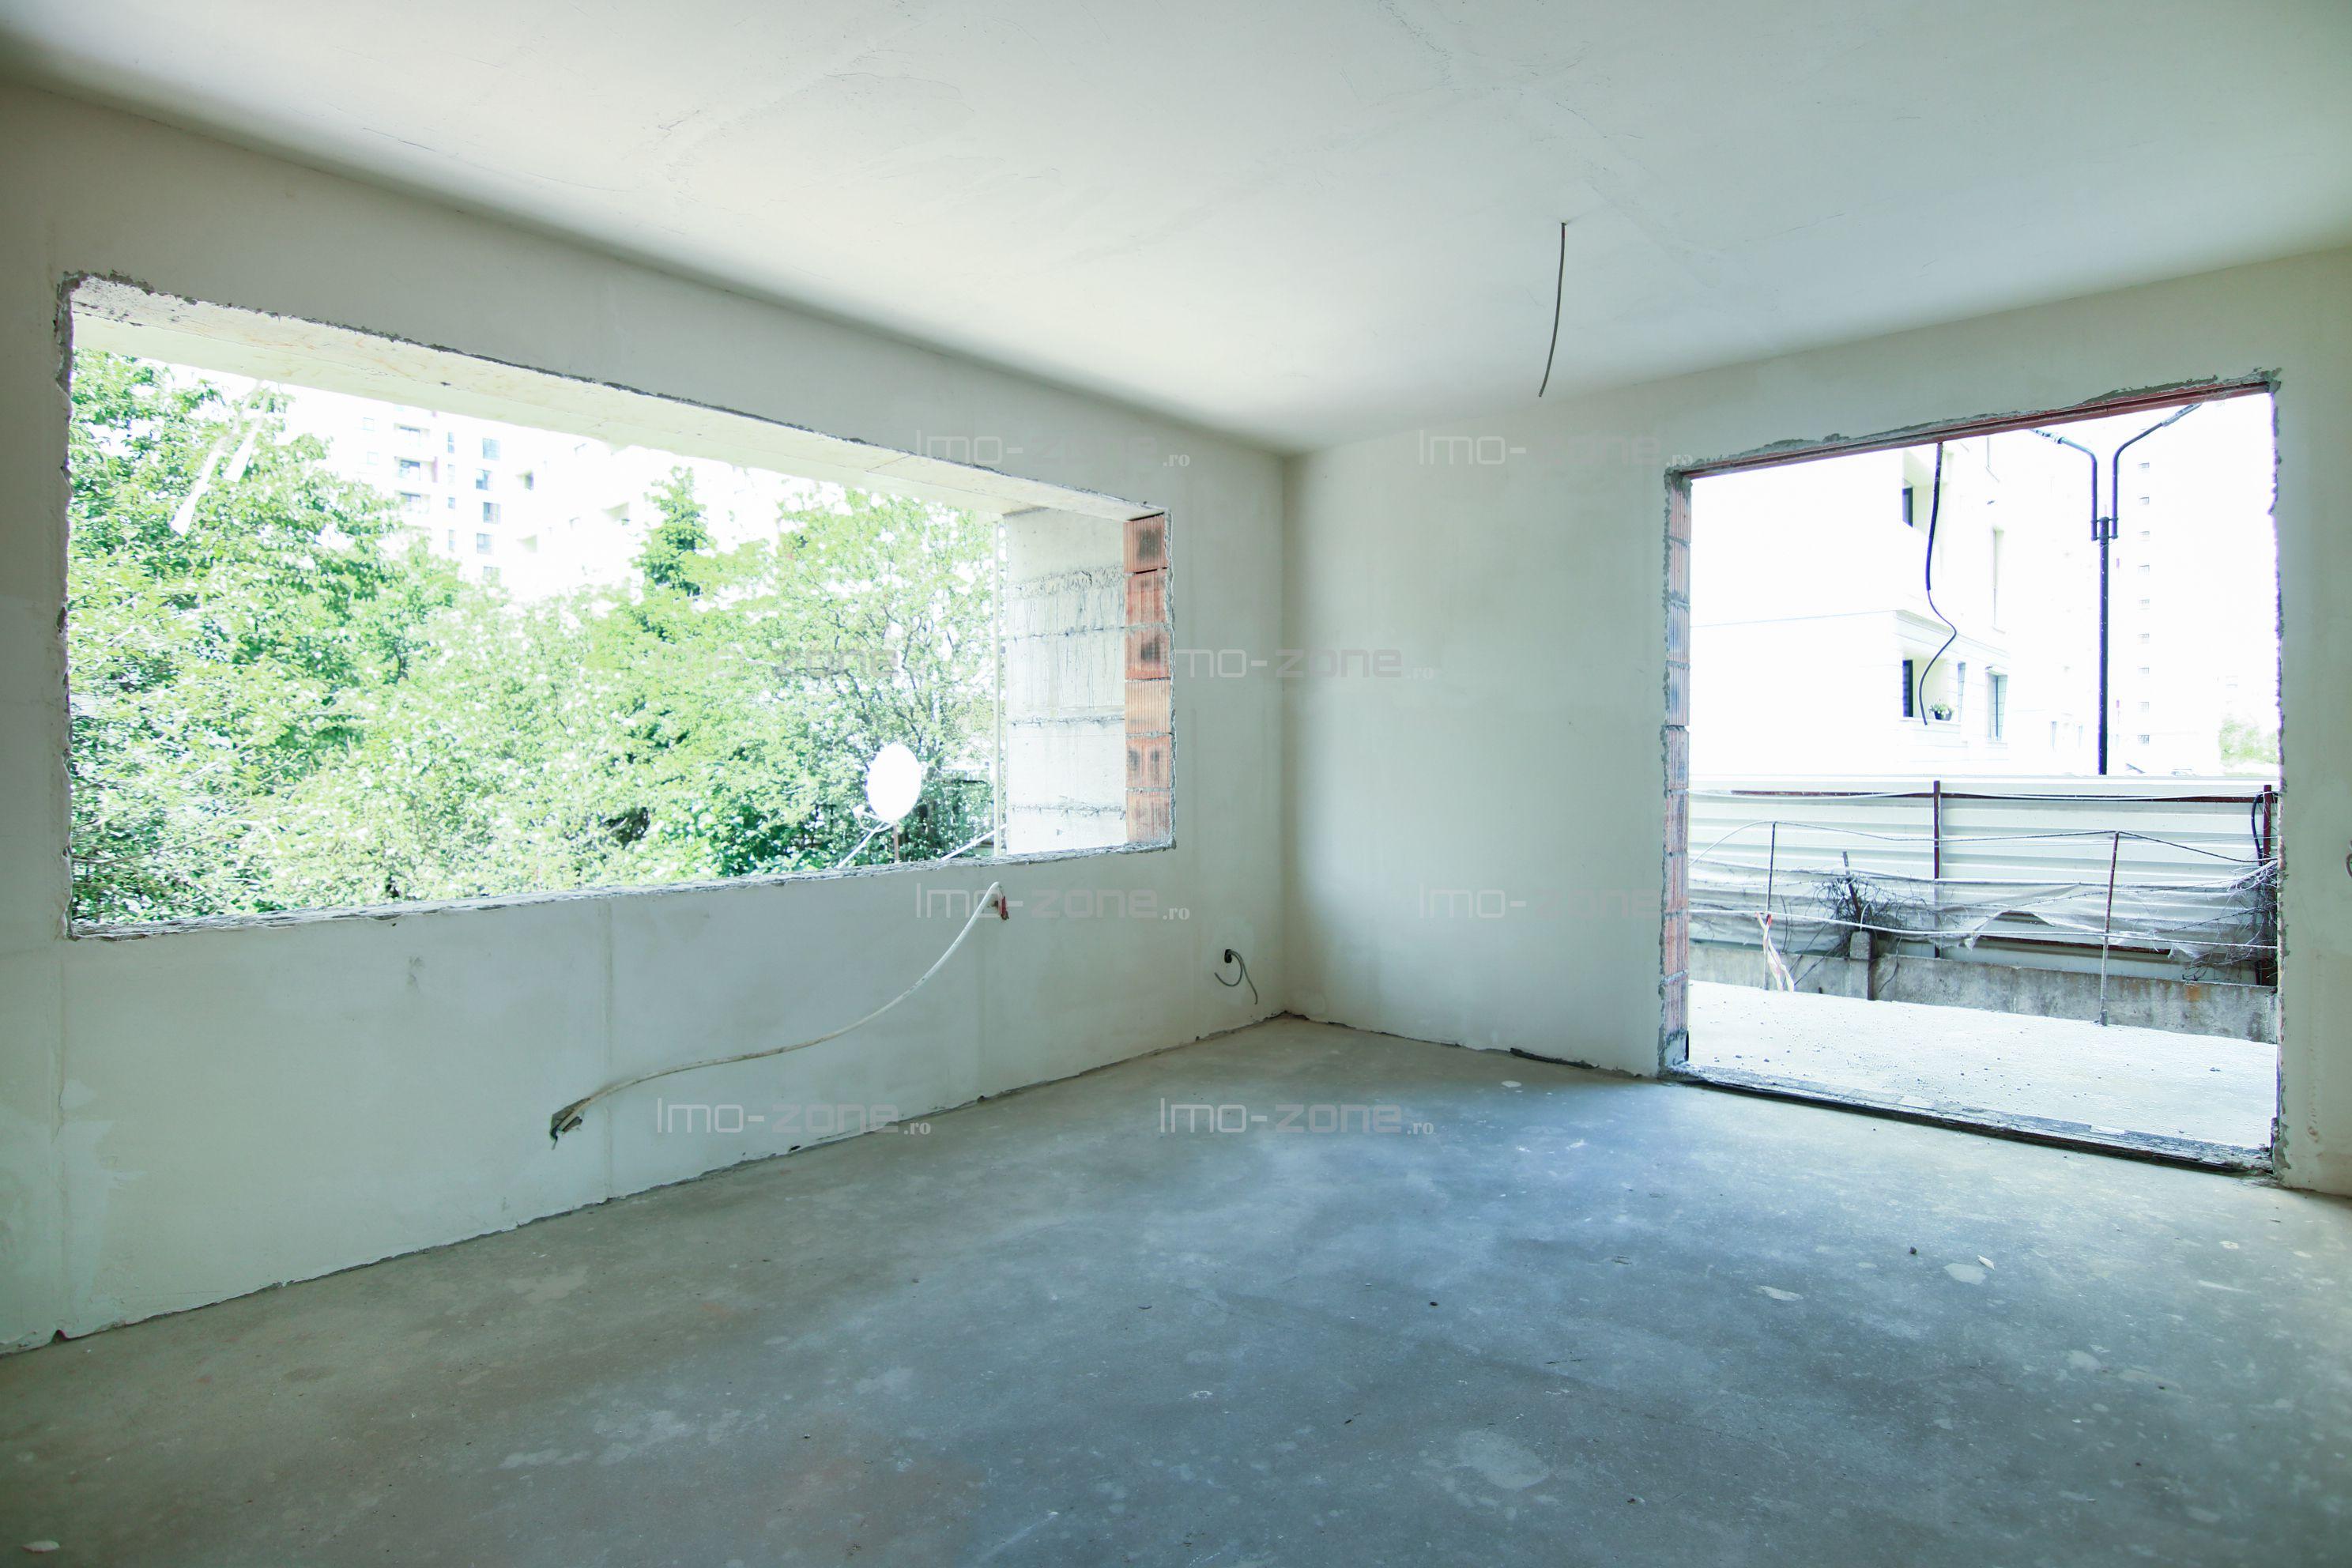 Apartament 2 camere, decomandat, 55 mp, langa Mall Plaza, comision 0%